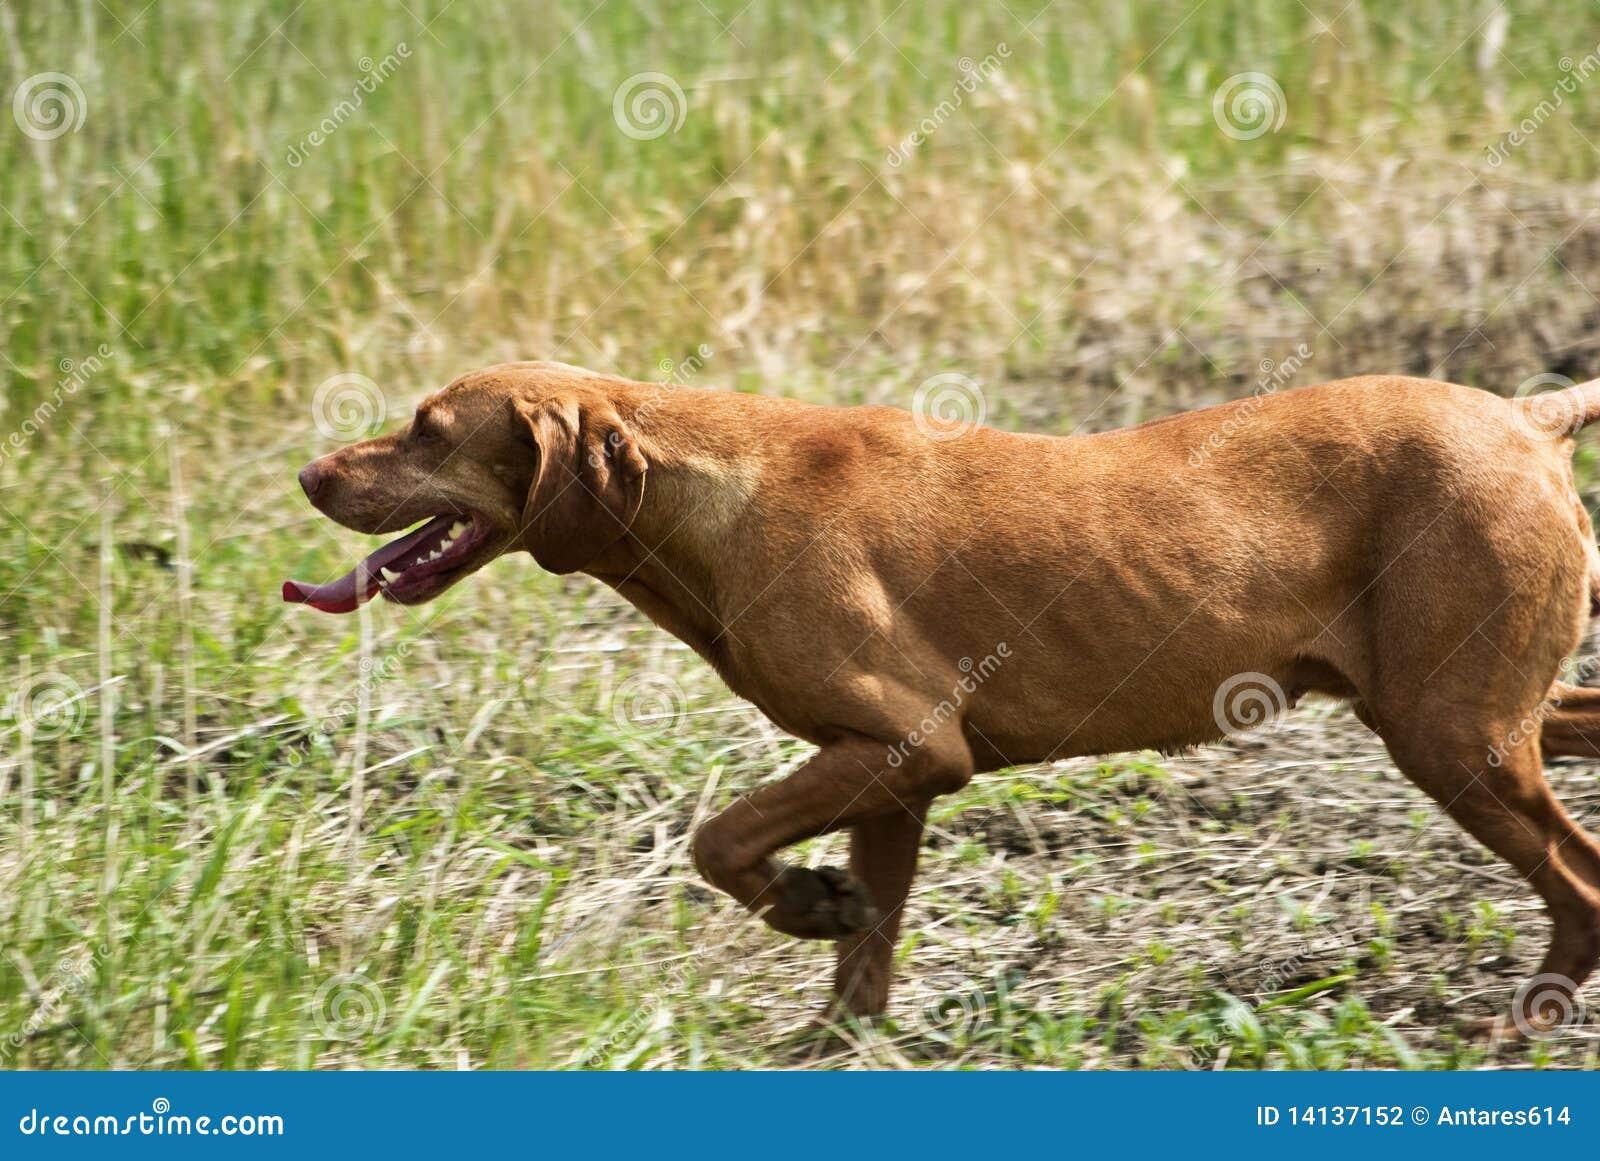 Hundjakt